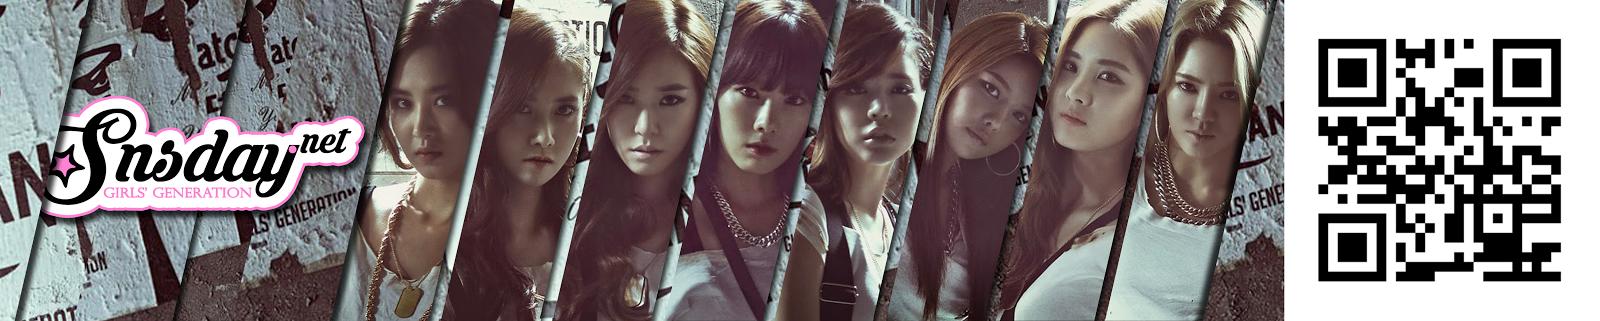 snsday | Girls' Generation day